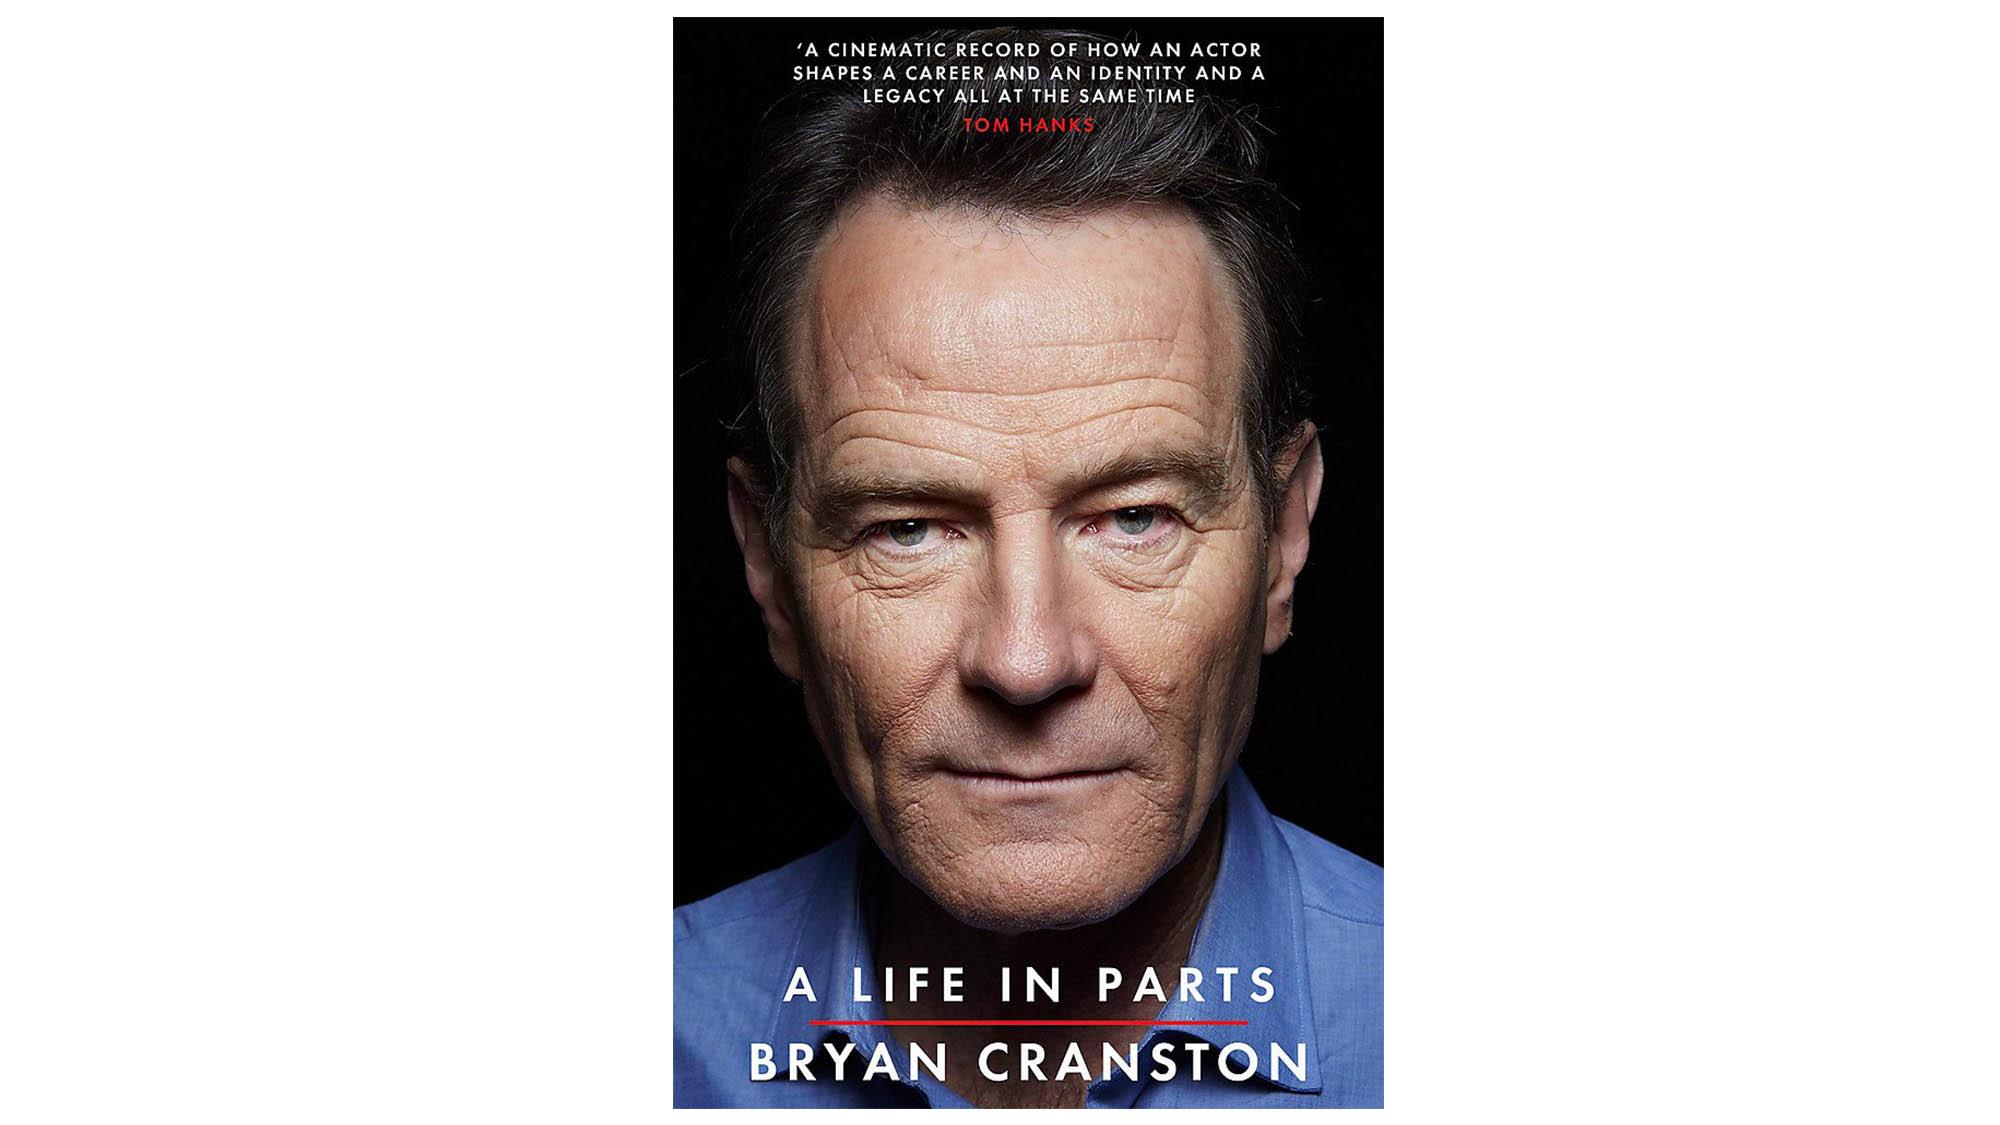 A life in parts – Bryan Cranston (Autobiographie)